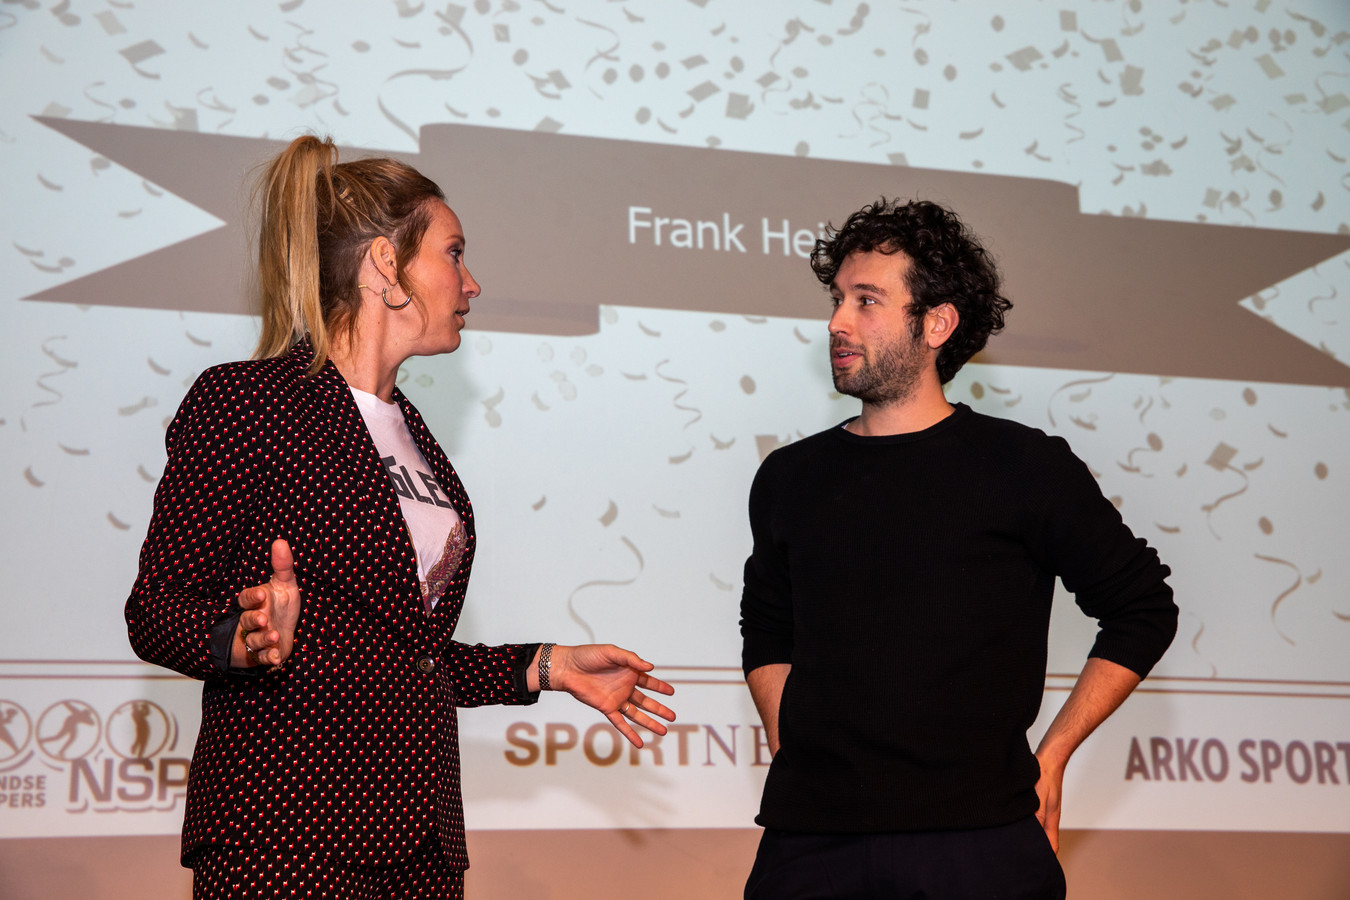 Frank Heinen met Hélène Hendriks.